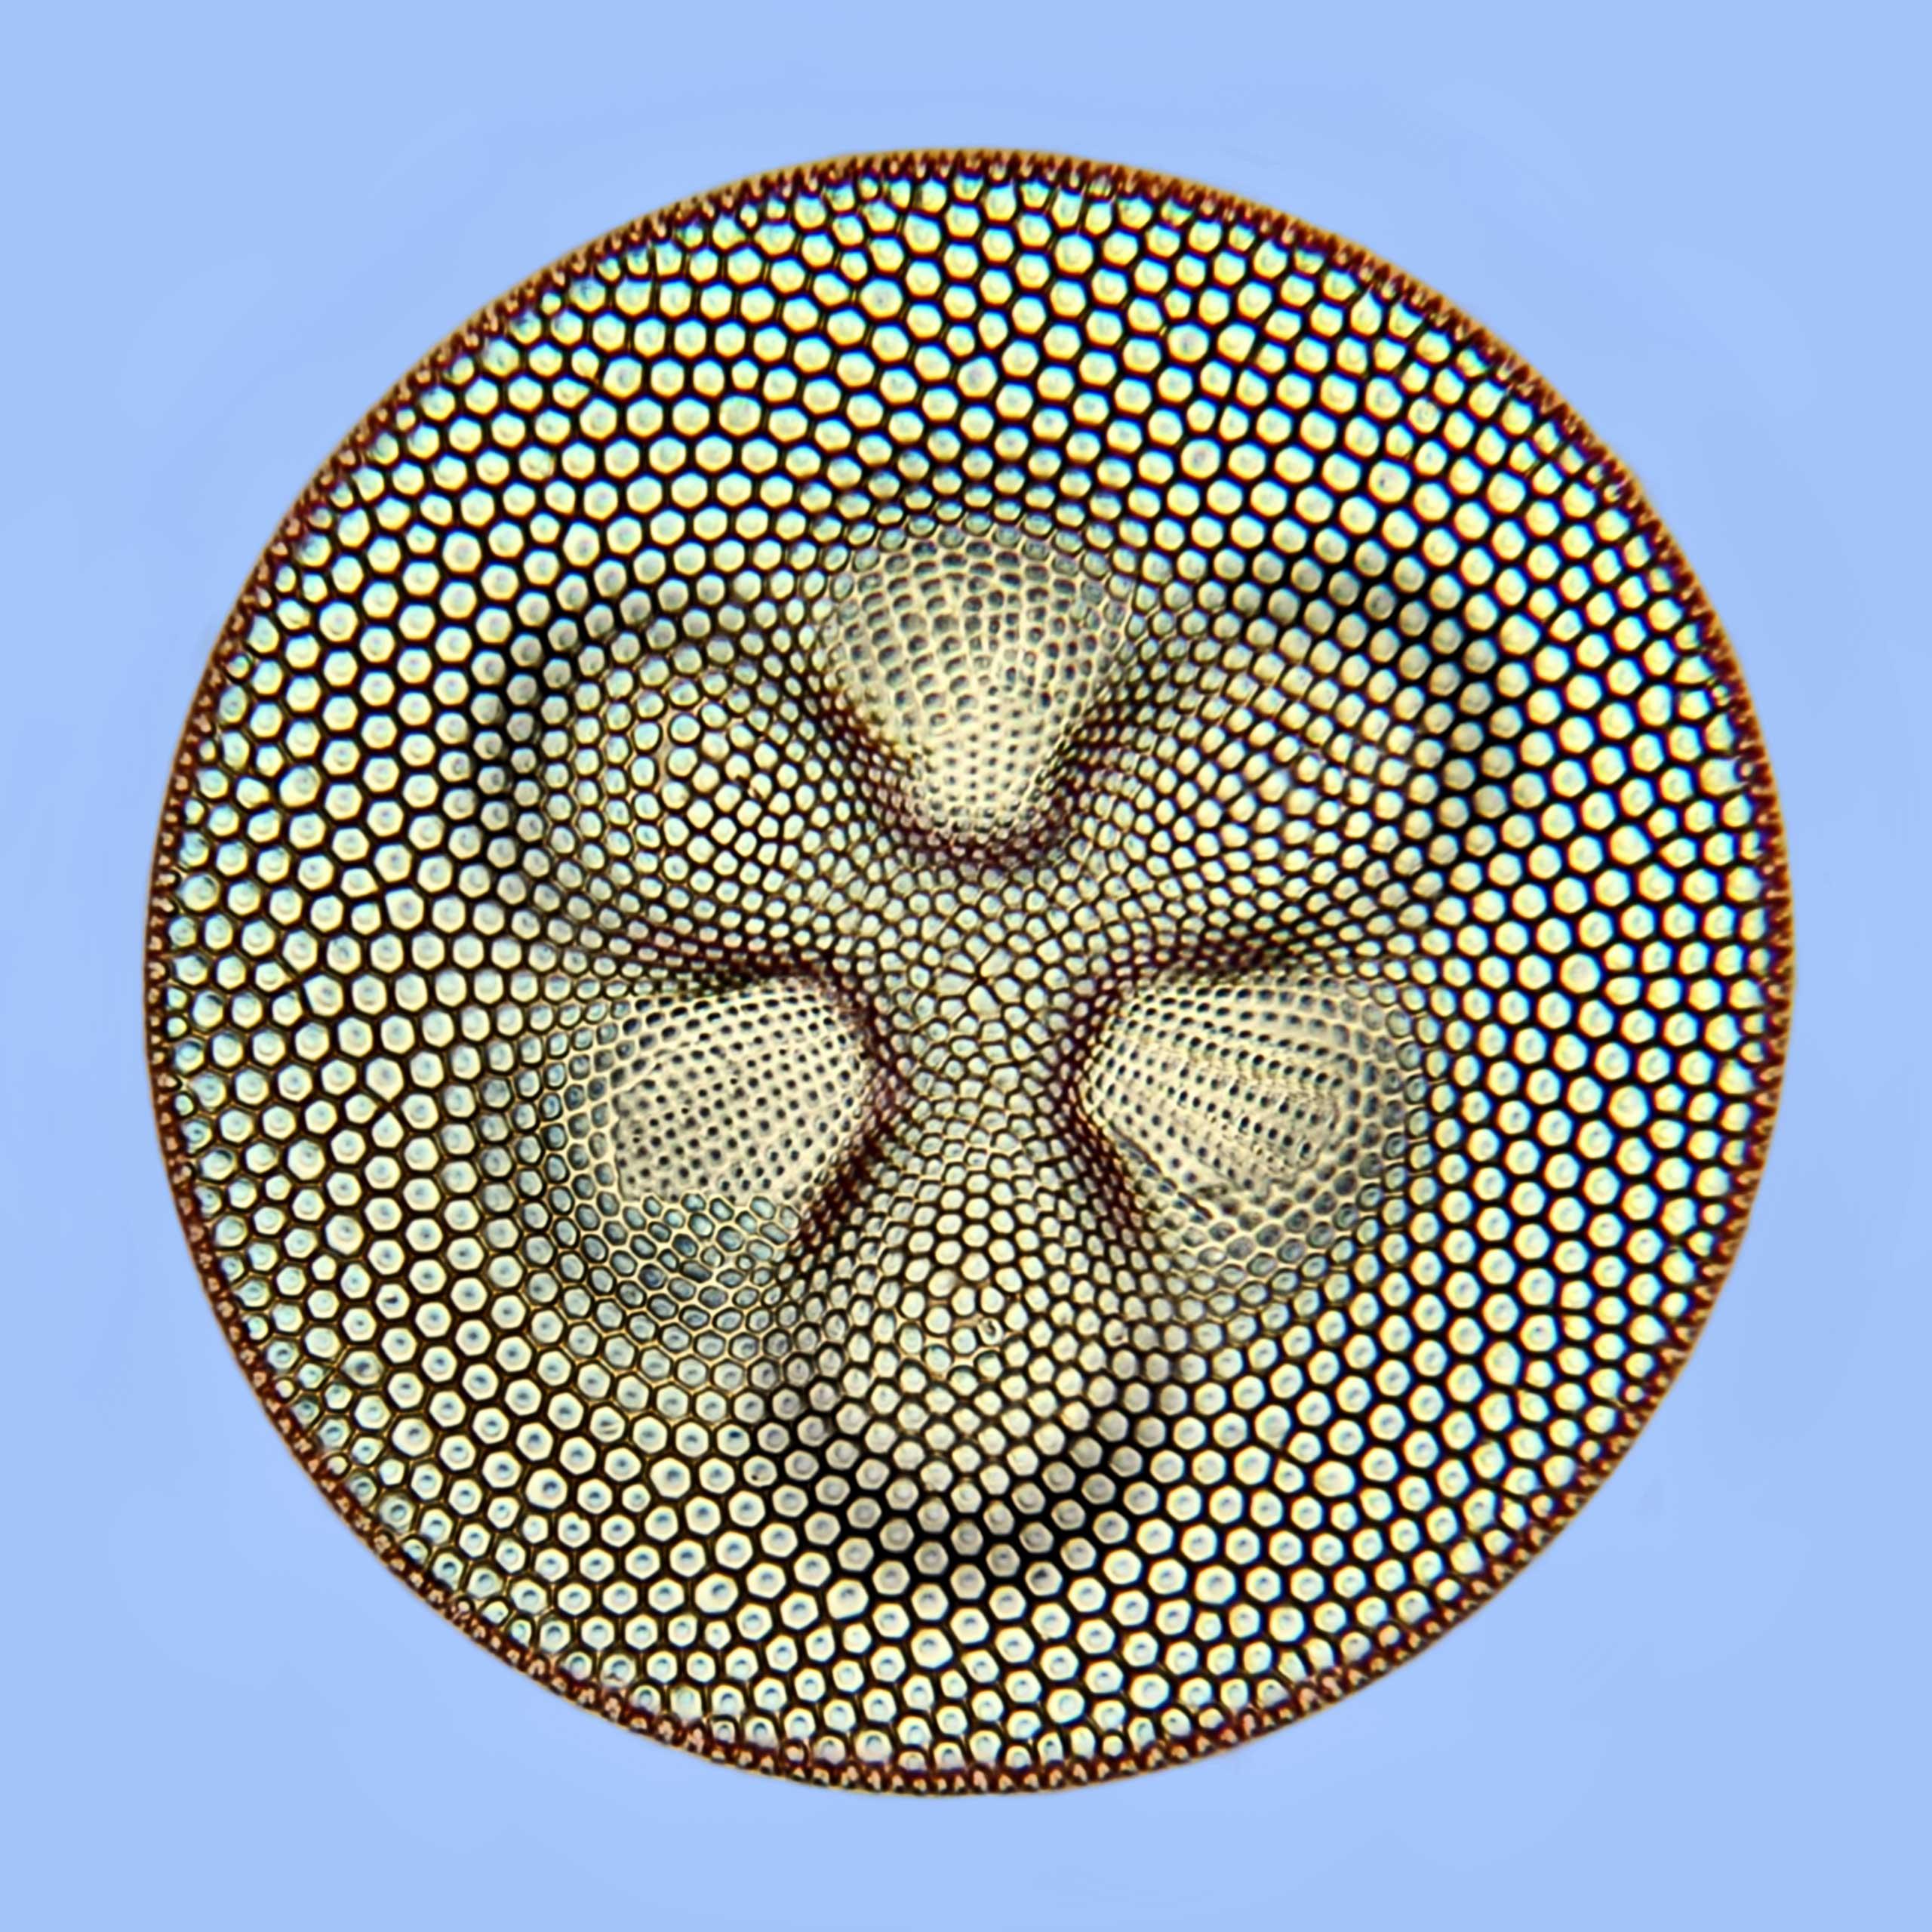 A diatom at 500x magnification.